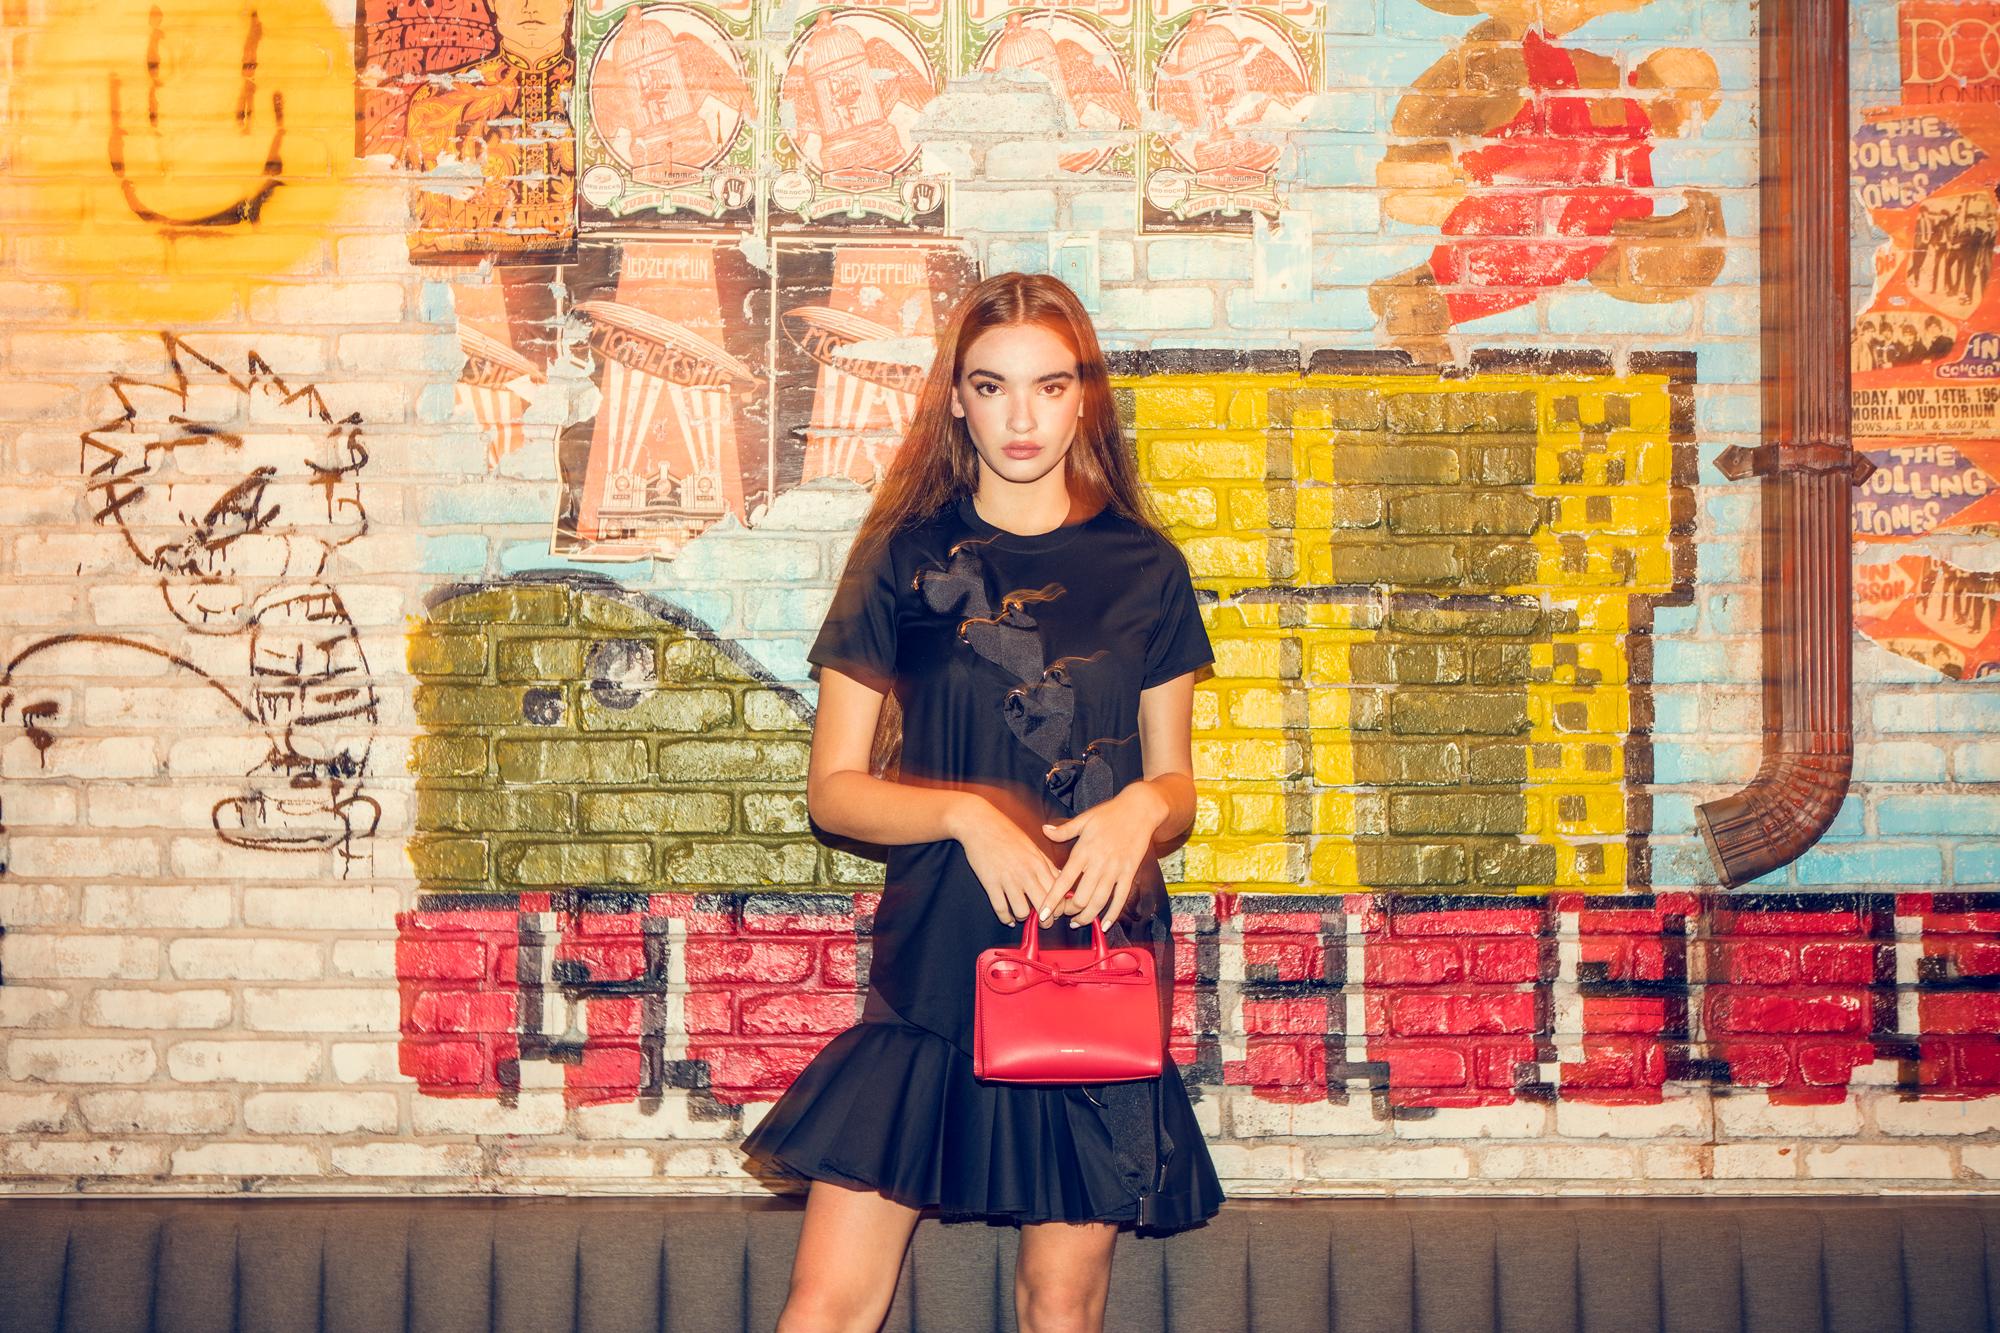 the+webster-top-marques+almeida186653-skirt-marques+almeida186650-bag-mansur+gavriel181621.jpg